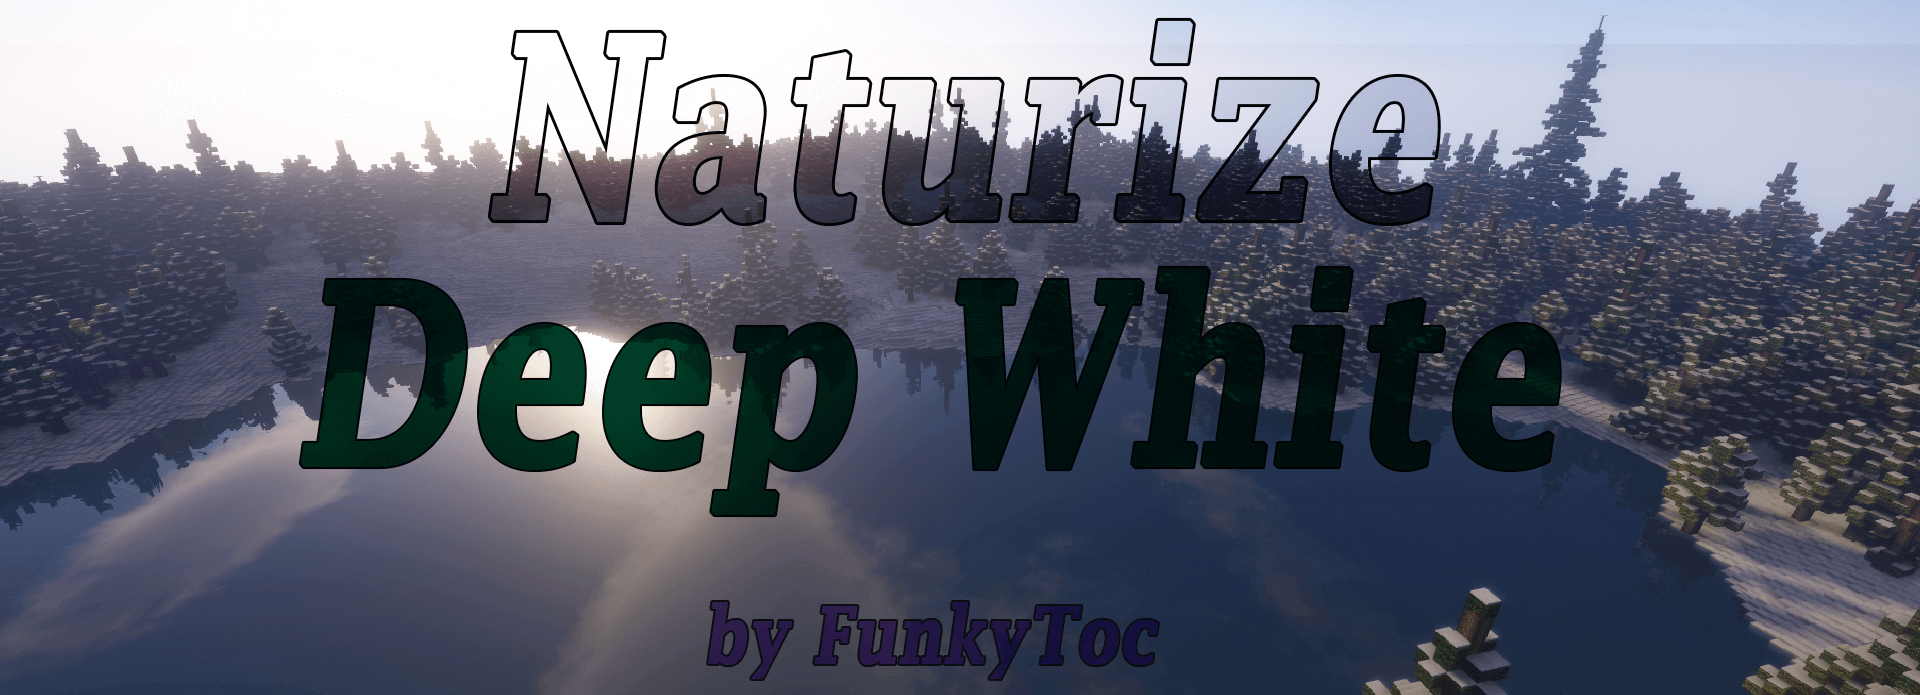 deepwhite_map_banner.png